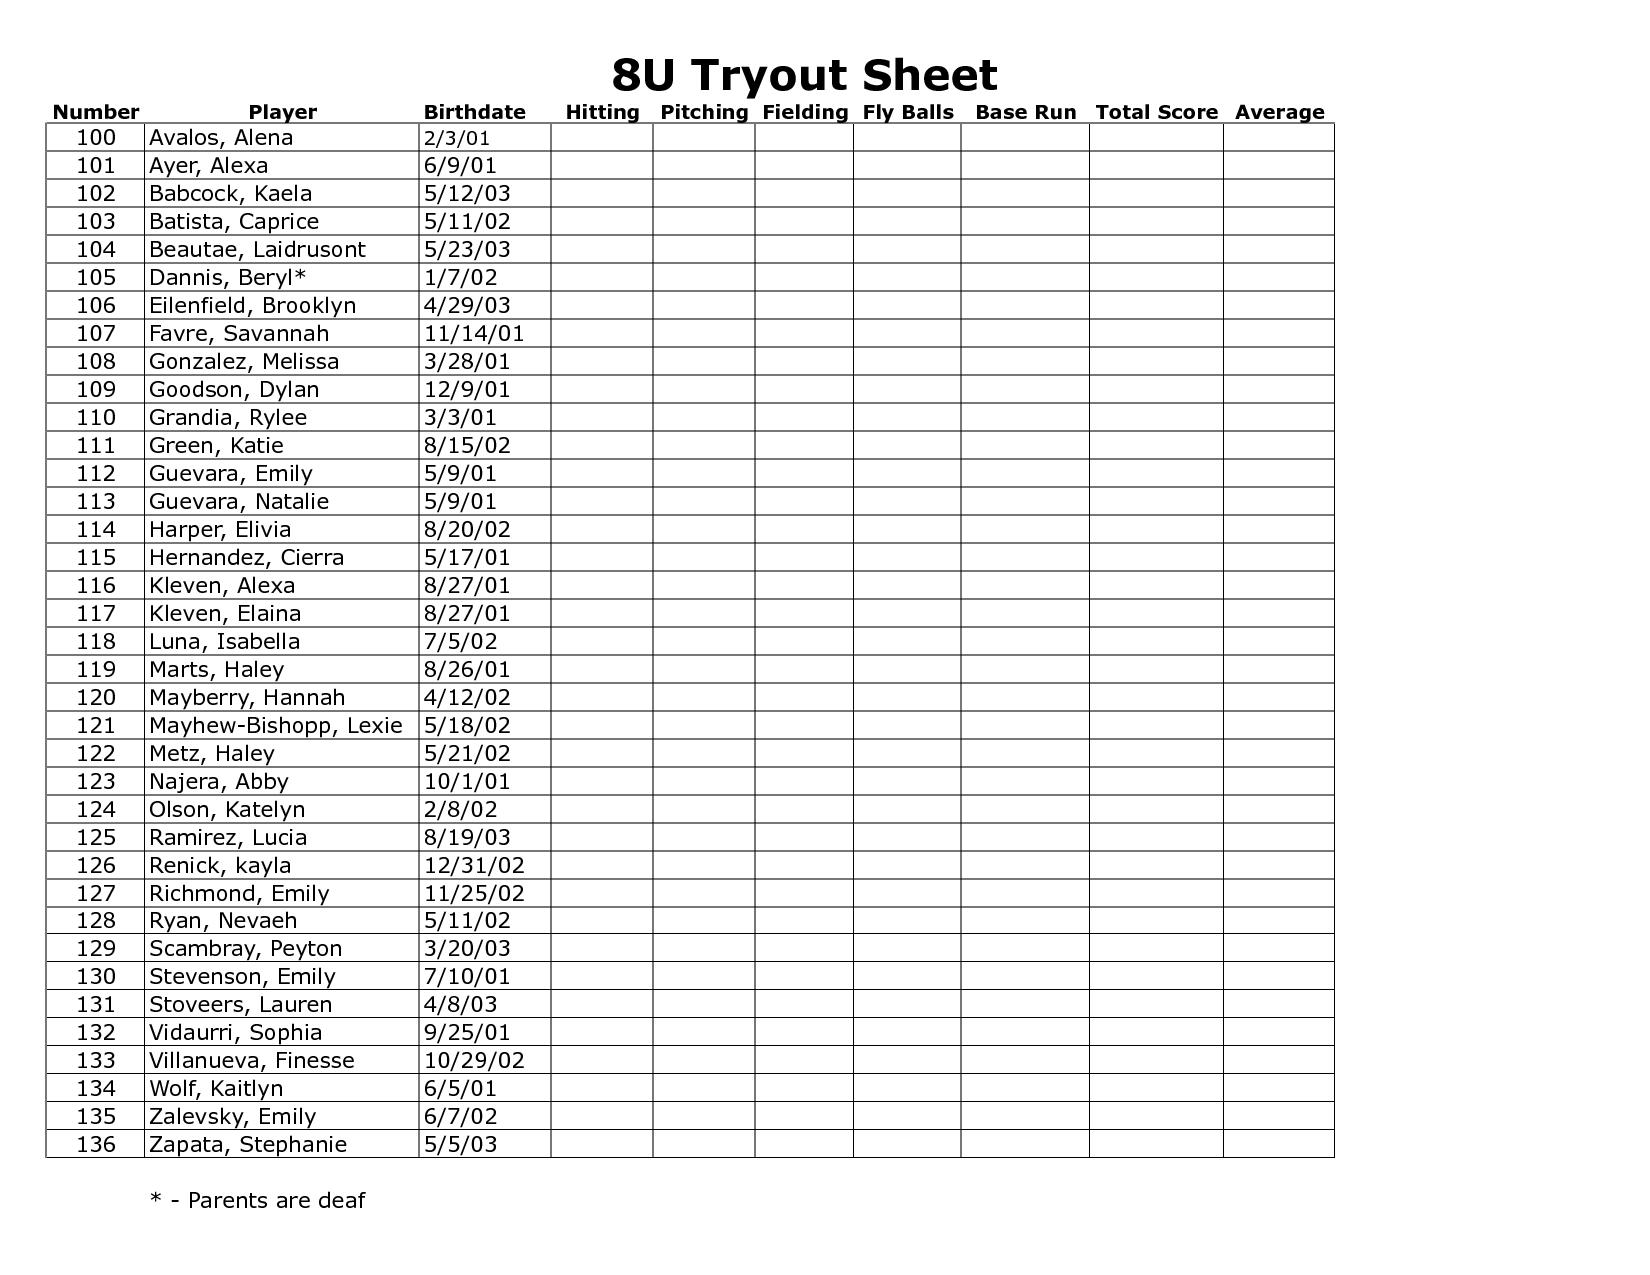 Unique Baseball Statistics Sheet Xls Xlsformat Xlstemplates Xlstemplate Spreadsheet Template Basketball Players Spreadsheet